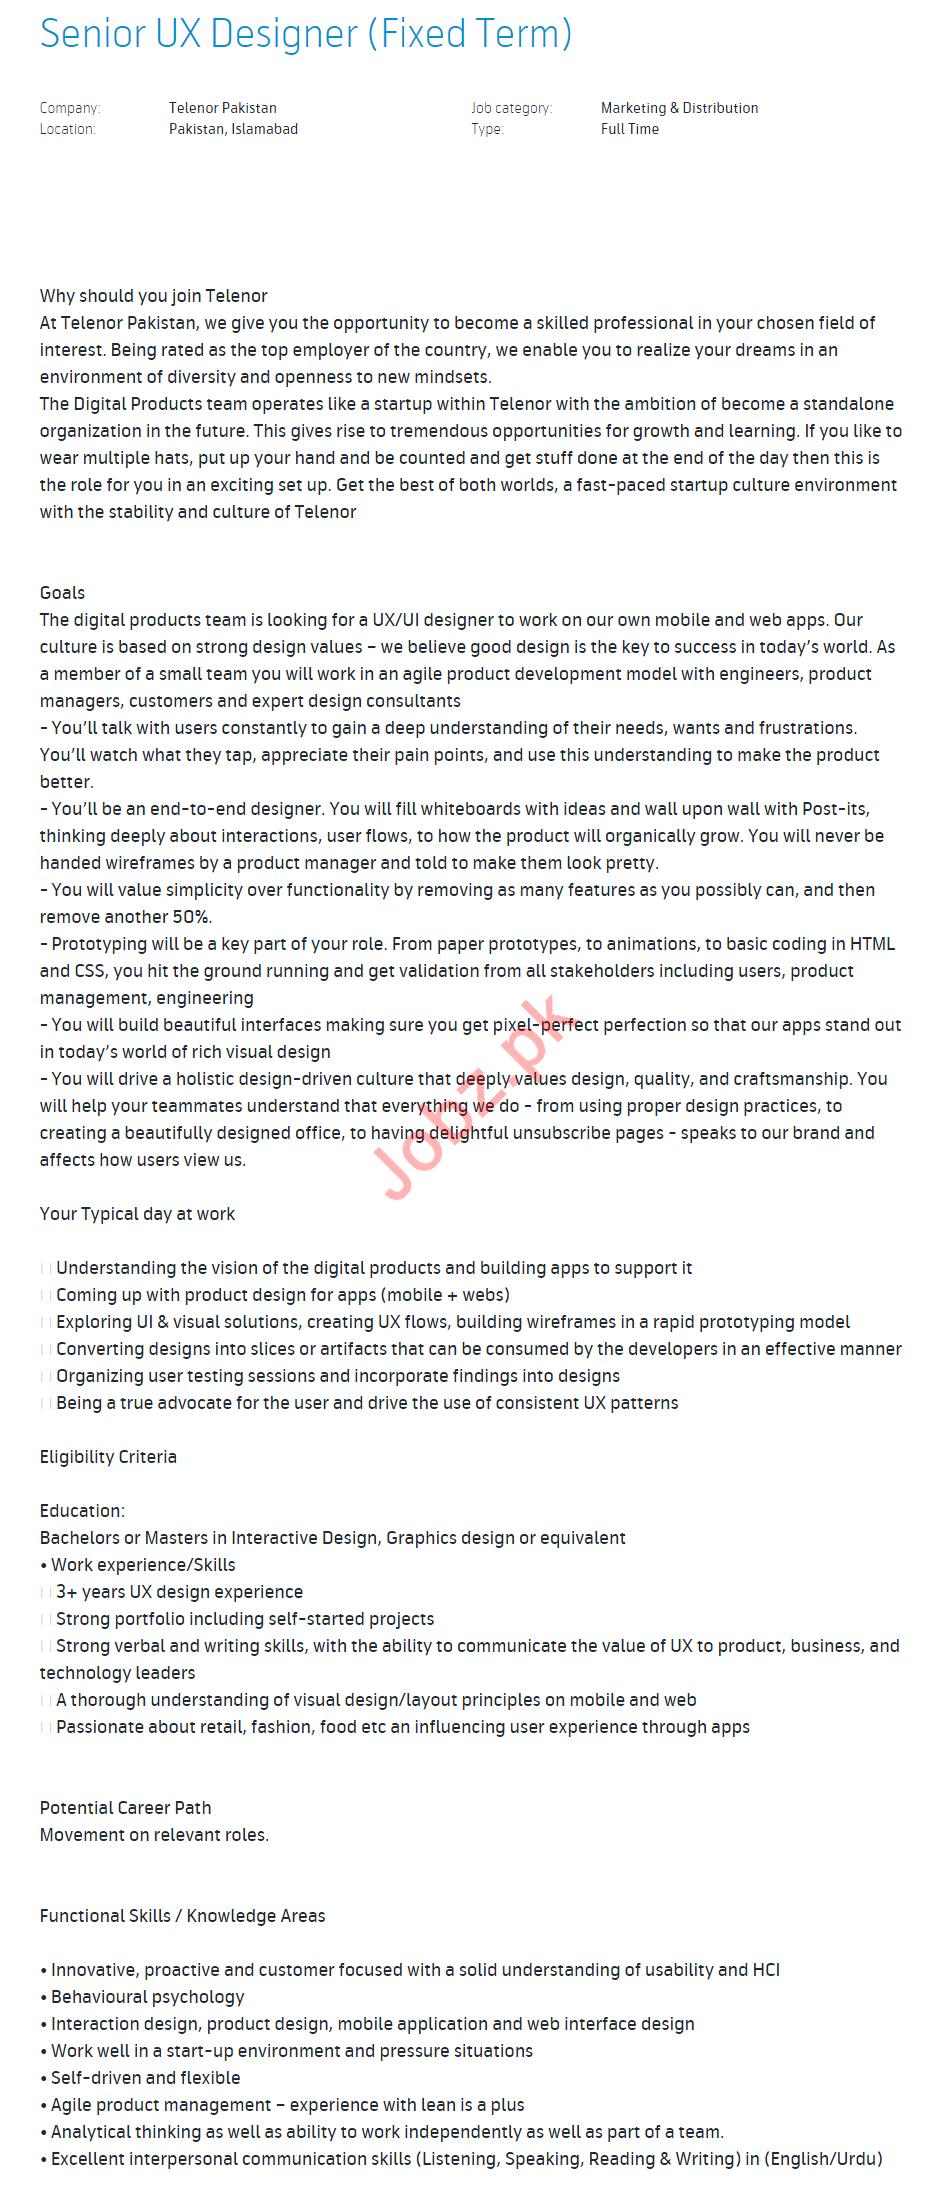 Senior Ux Designer Job 2019 In Islamabad 2020 Job Advertisement Pakistan